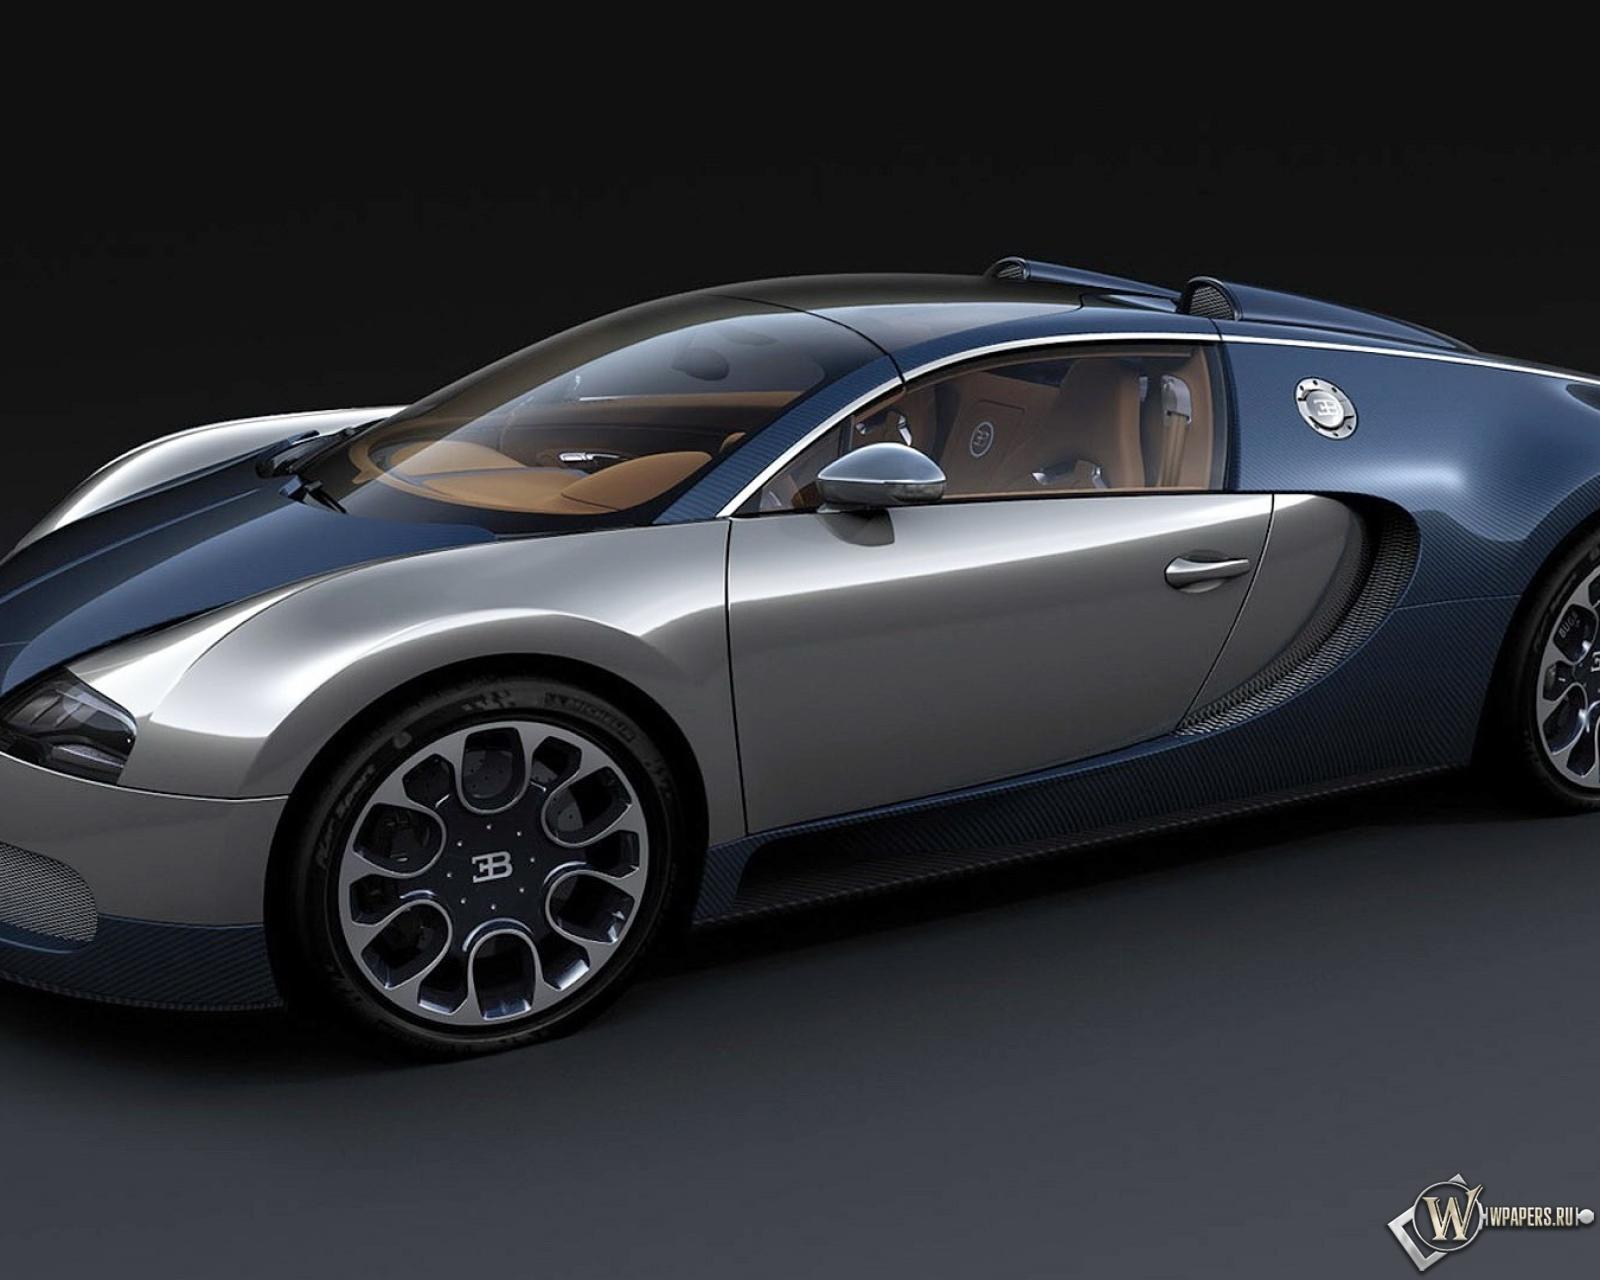 bugatti veyron bugatti veyron 1600 1280 5 4. Black Bedroom Furniture Sets. Home Design Ideas